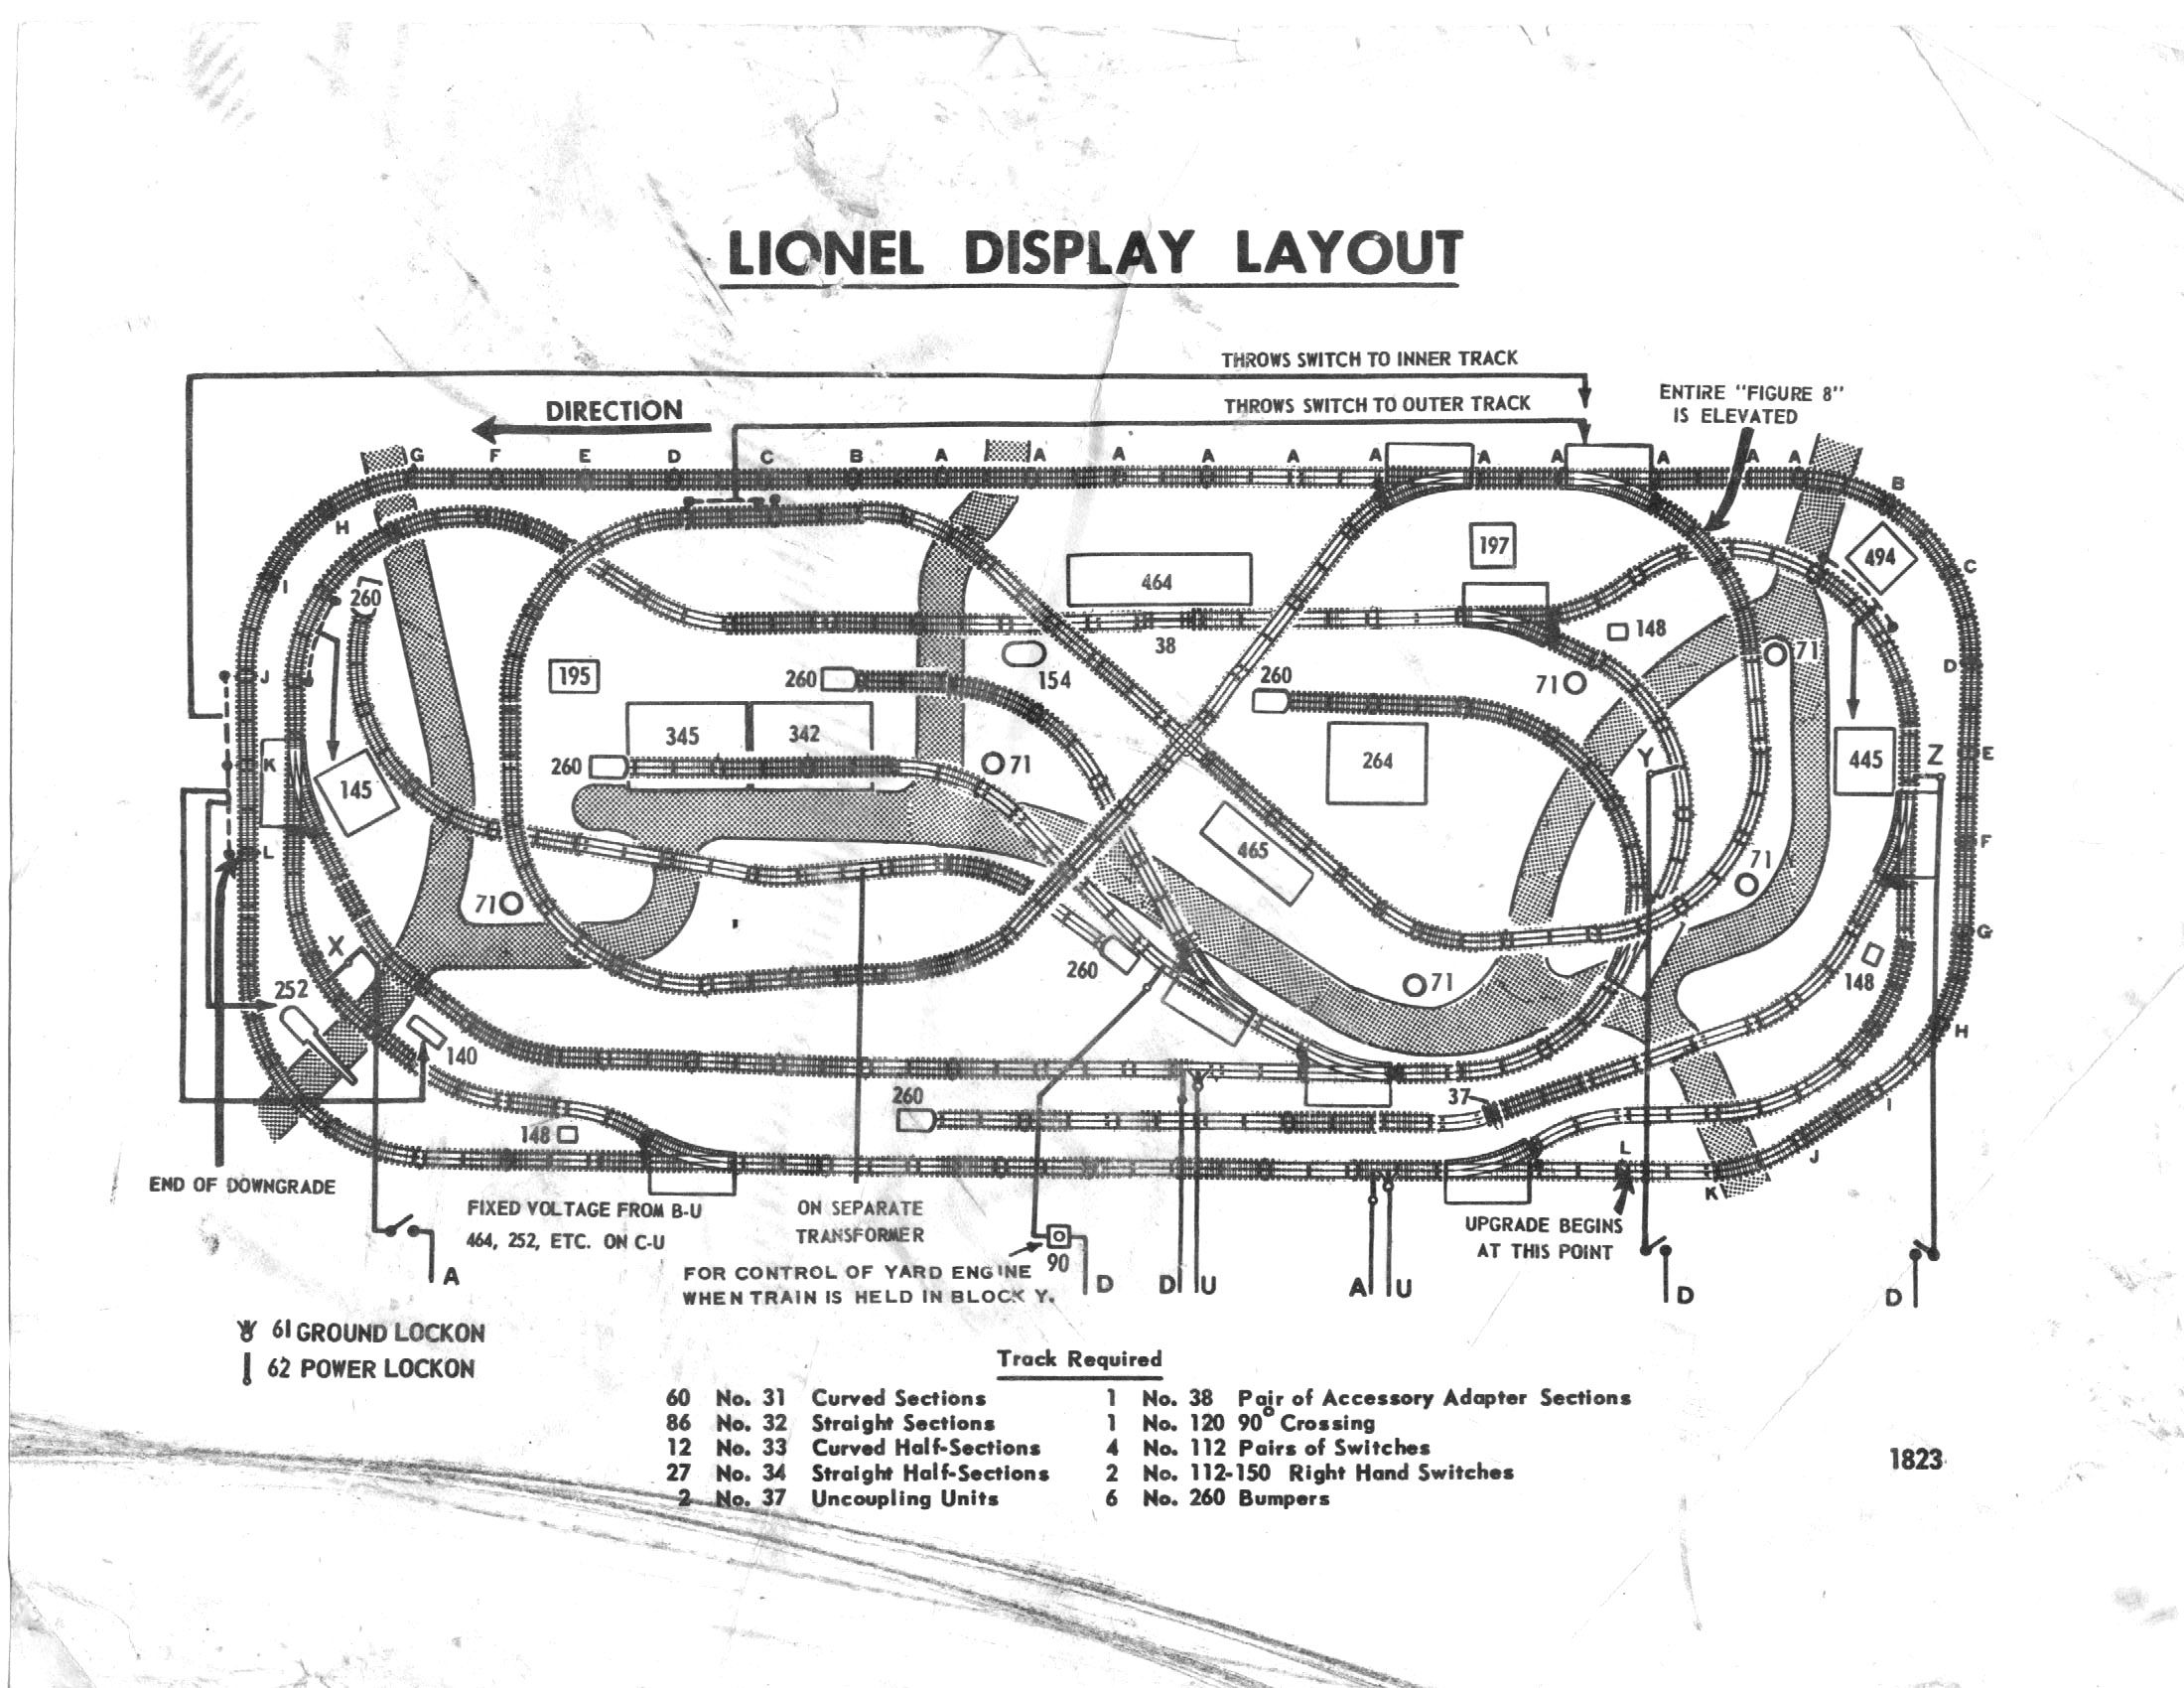 Lionel Display Layout | Lionel Trains | Pinterest | Layouts